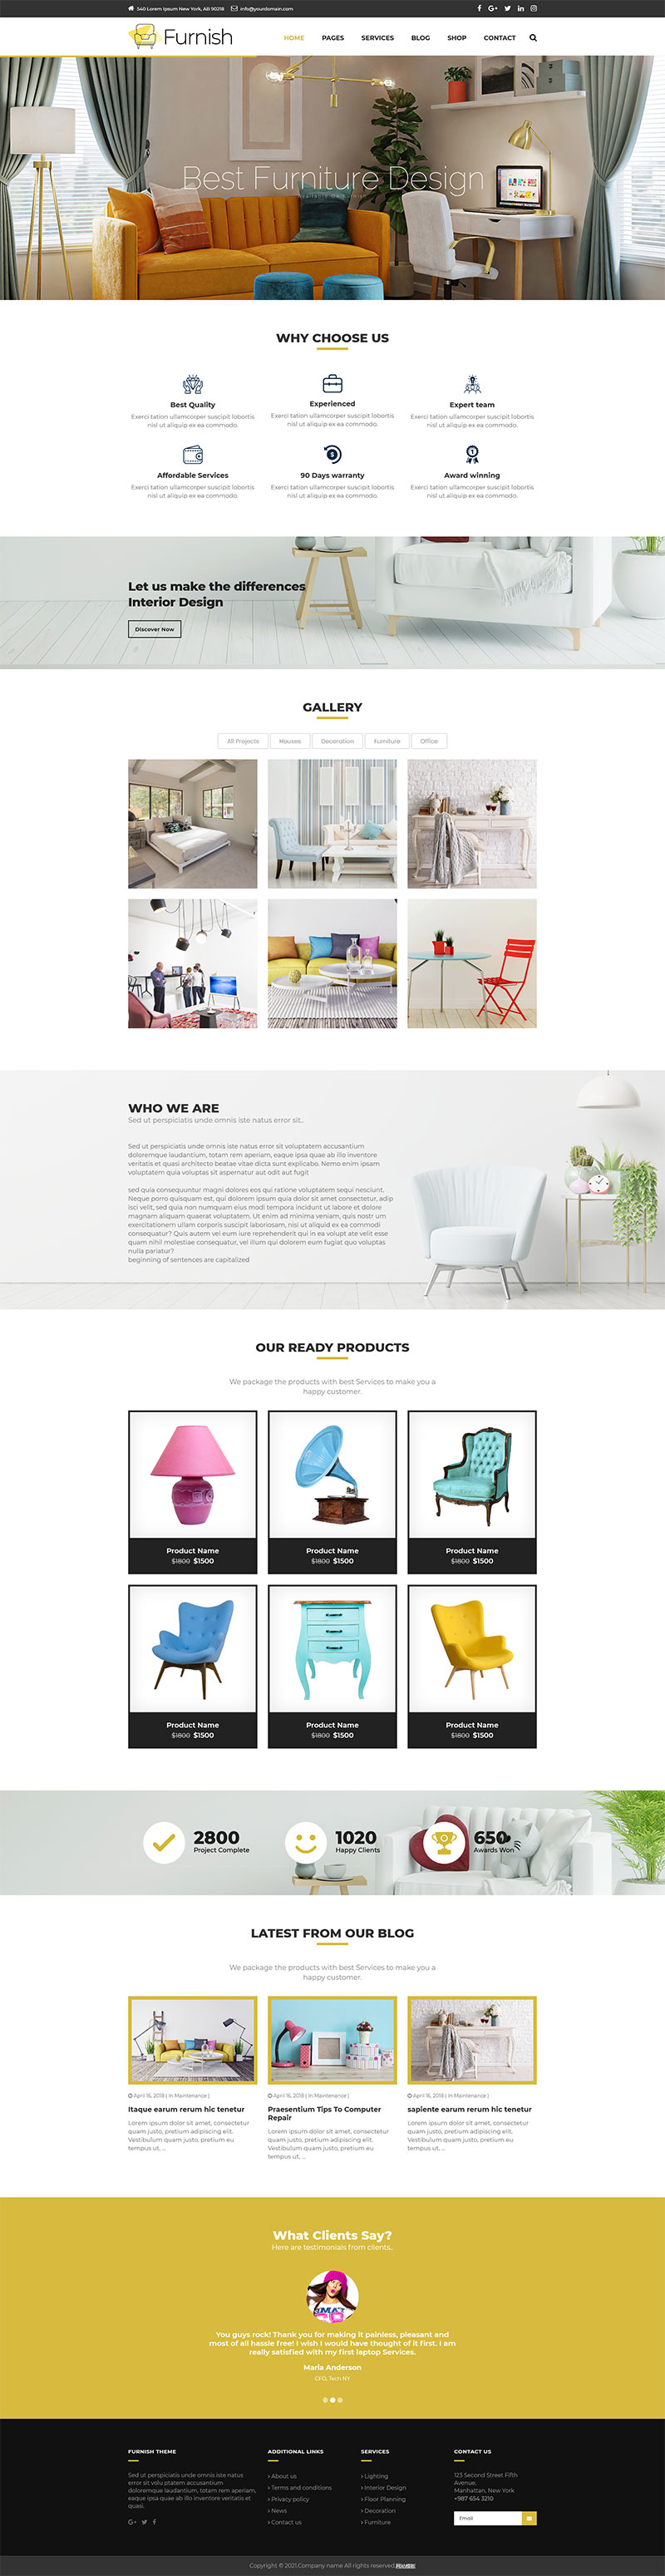 html5响应式室内装潢装饰装修公司网站模板